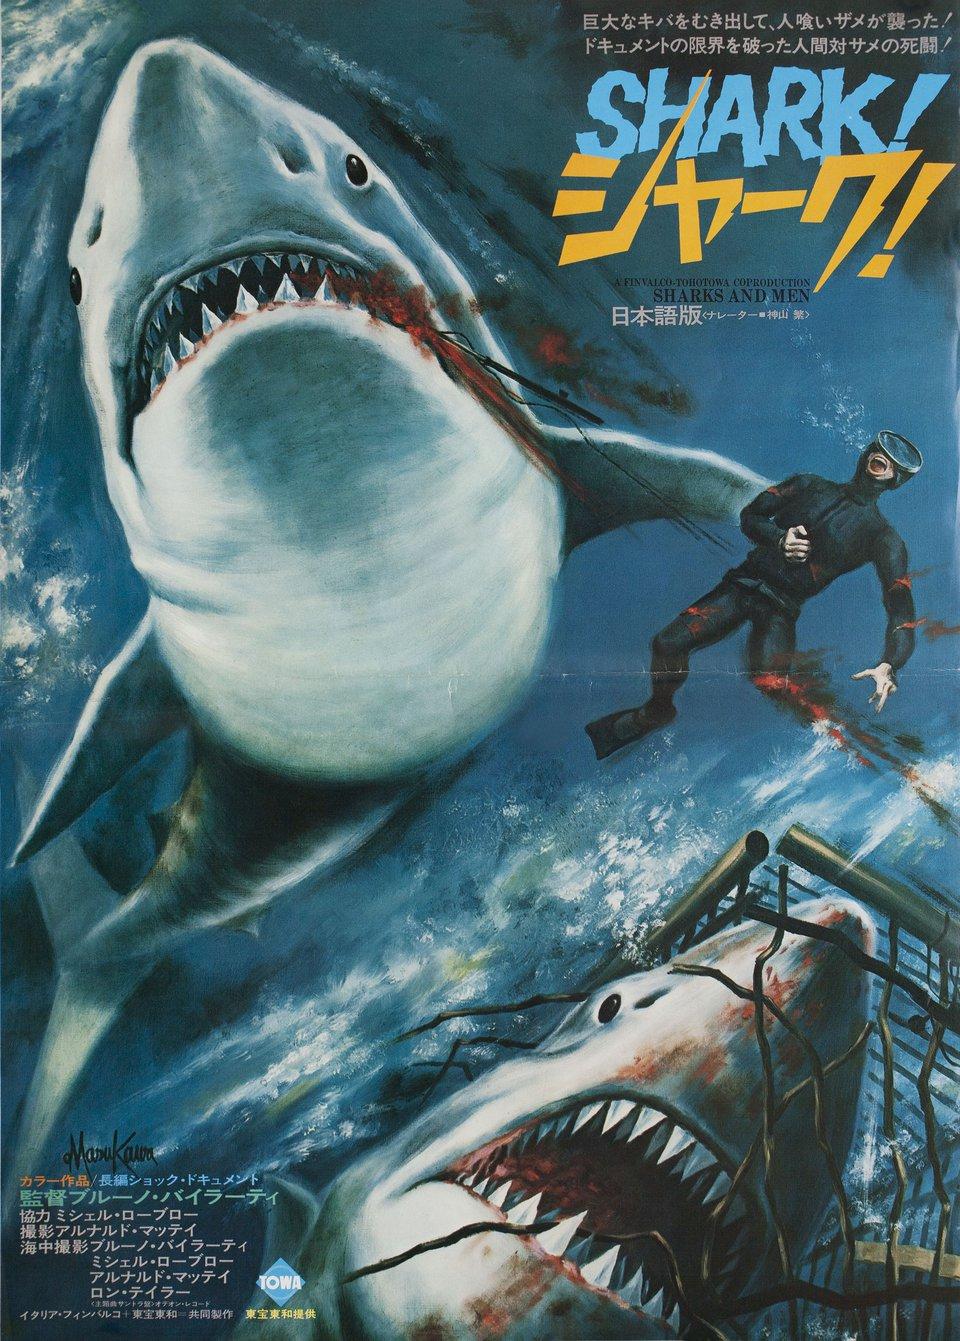 Sharks and Men 1976 Japanese B3 Poster